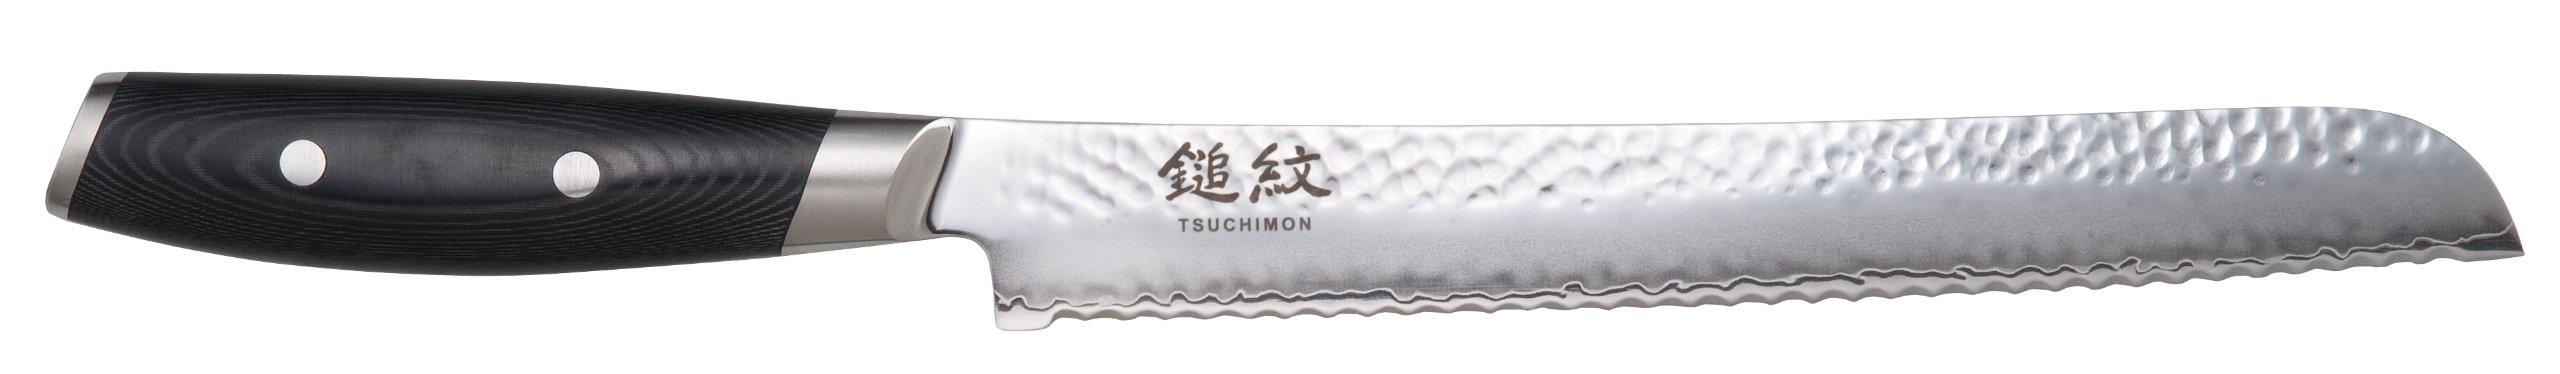 Yaxell Tsuchimon Bread Knife, 9-inch